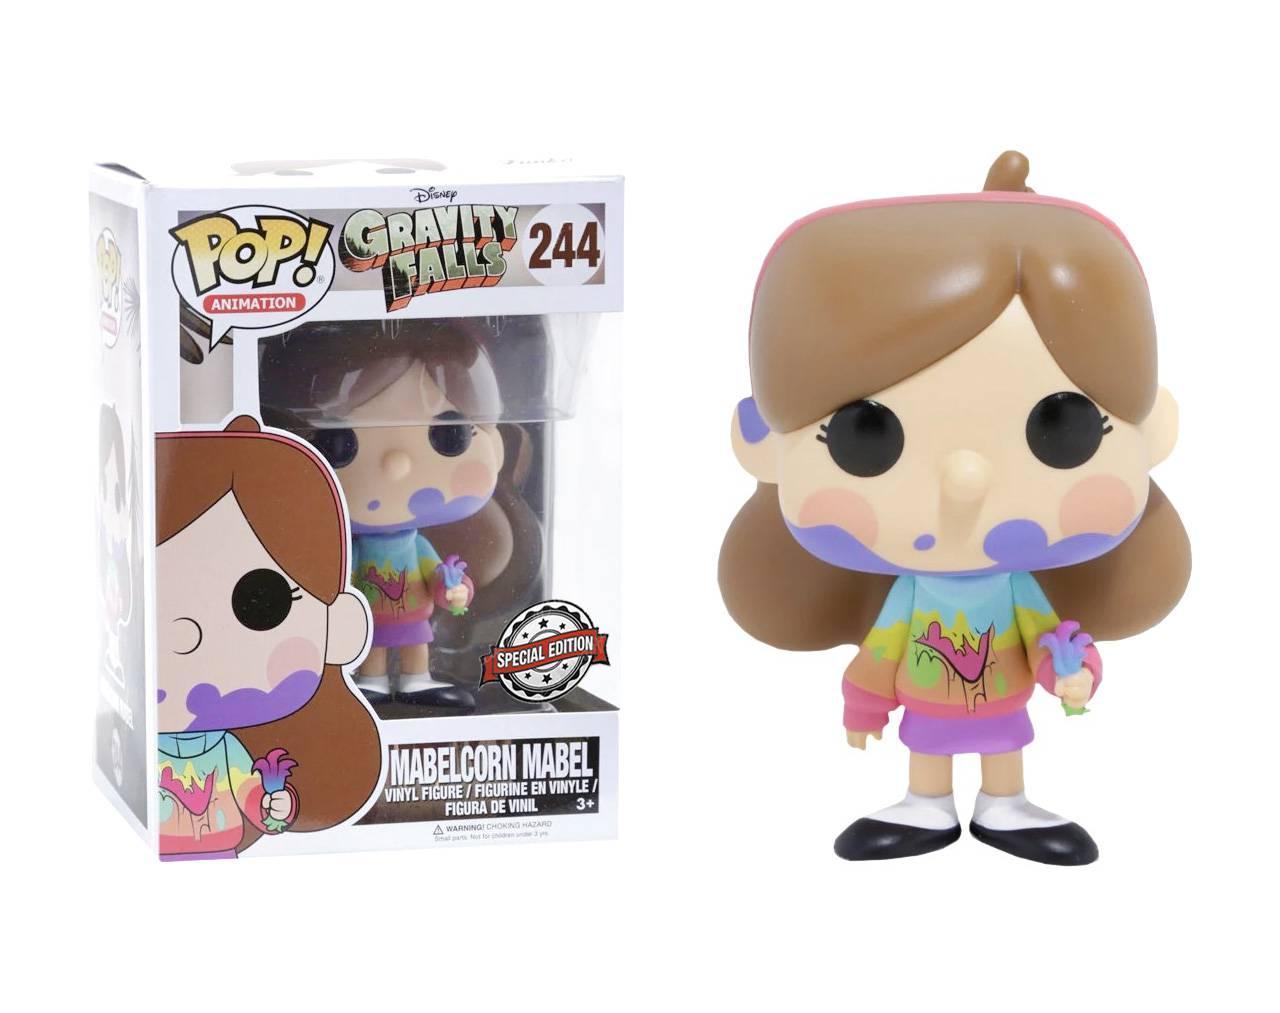 Mabelcorn Mabel Pop! Vinyl